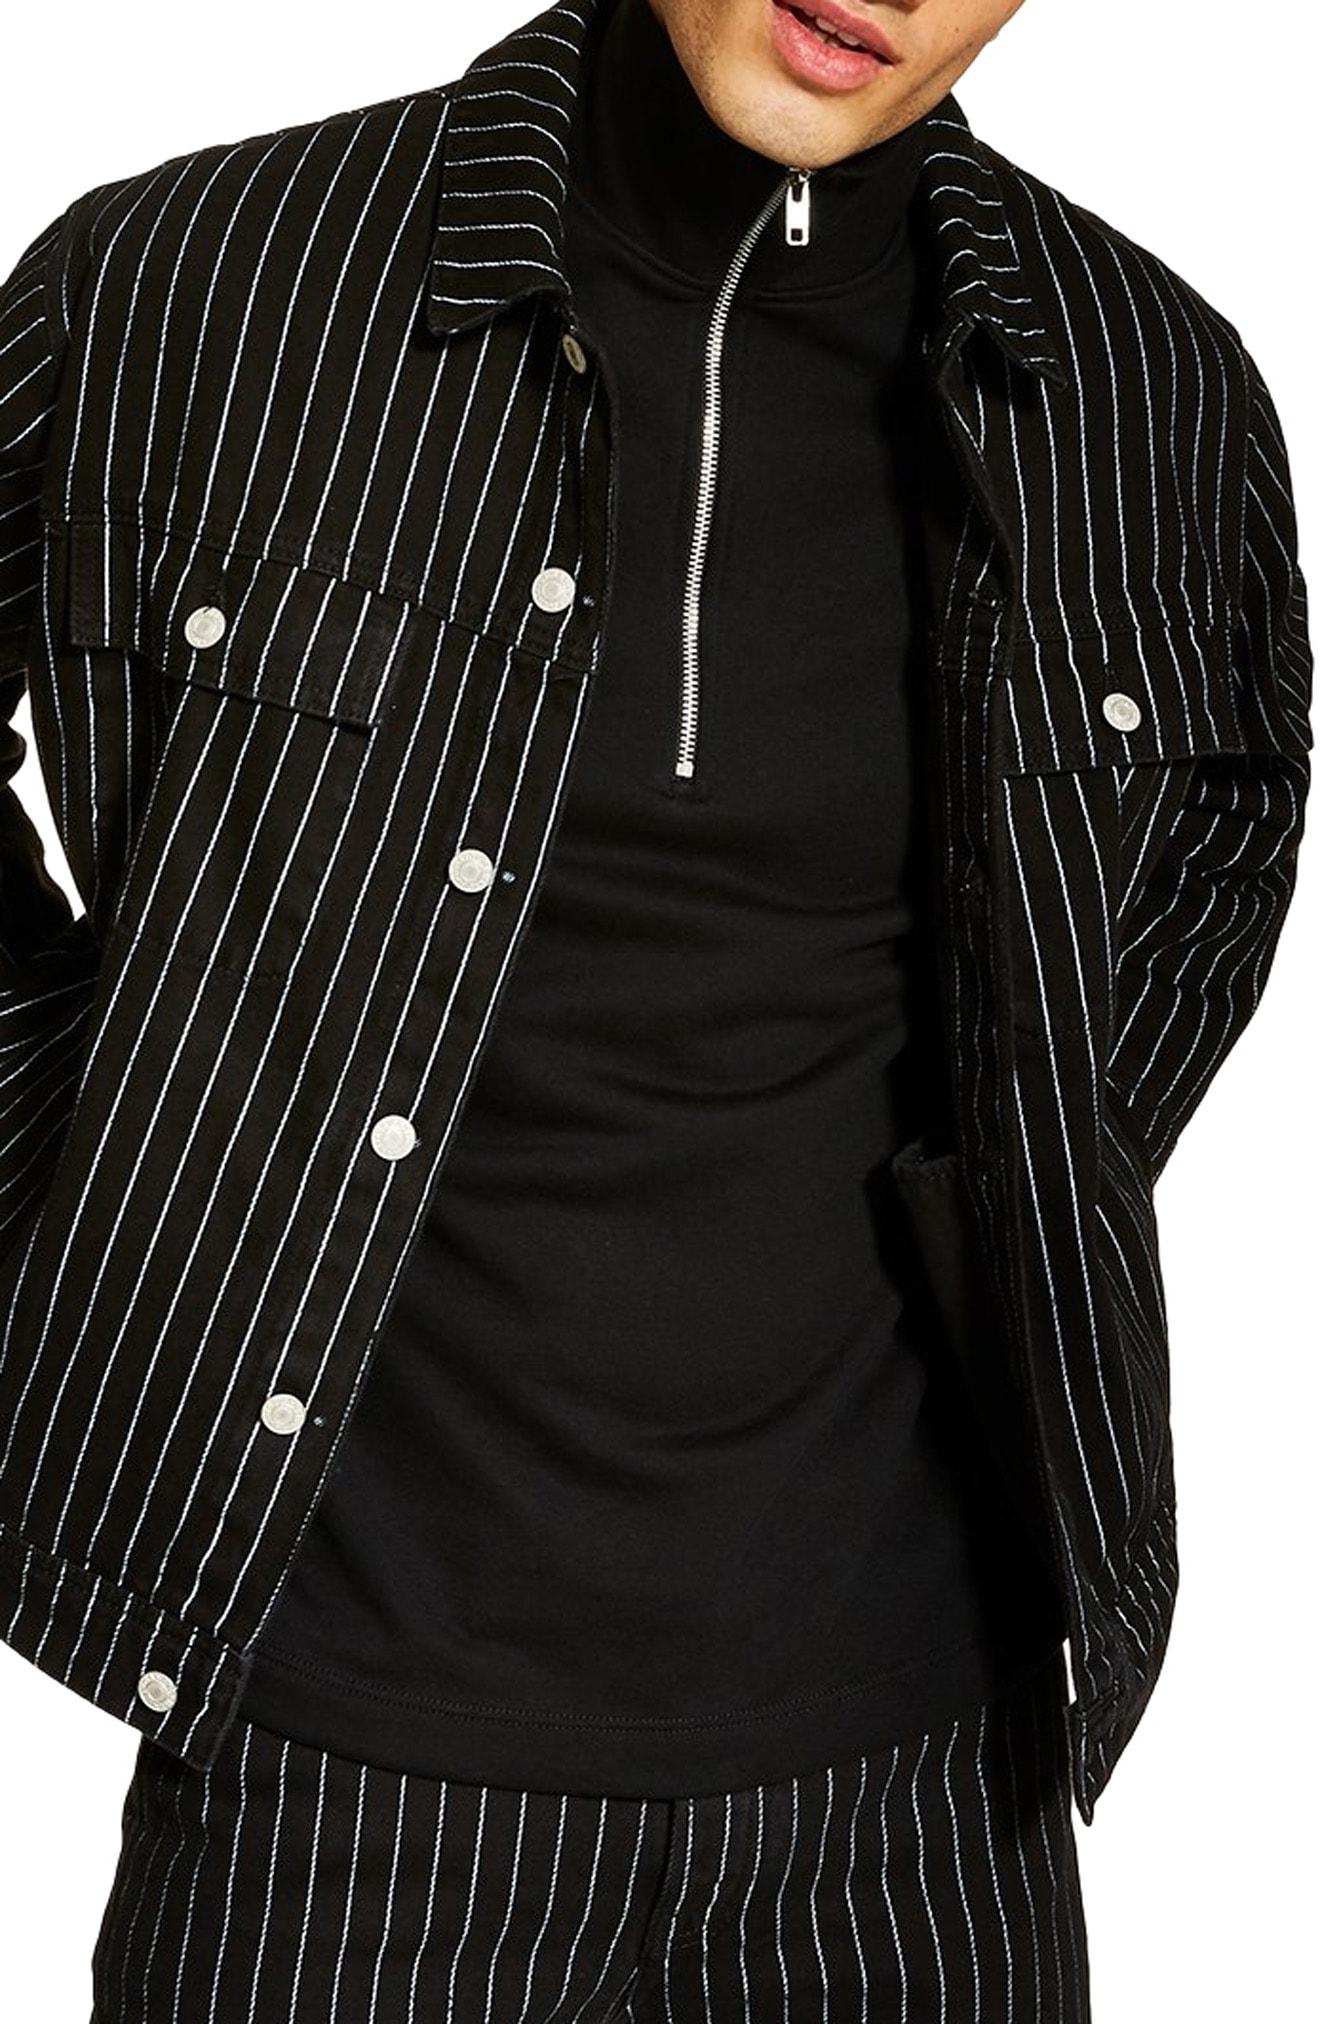 Men S Topman Pinstripe Oversize Denim Jacket Size Large Black